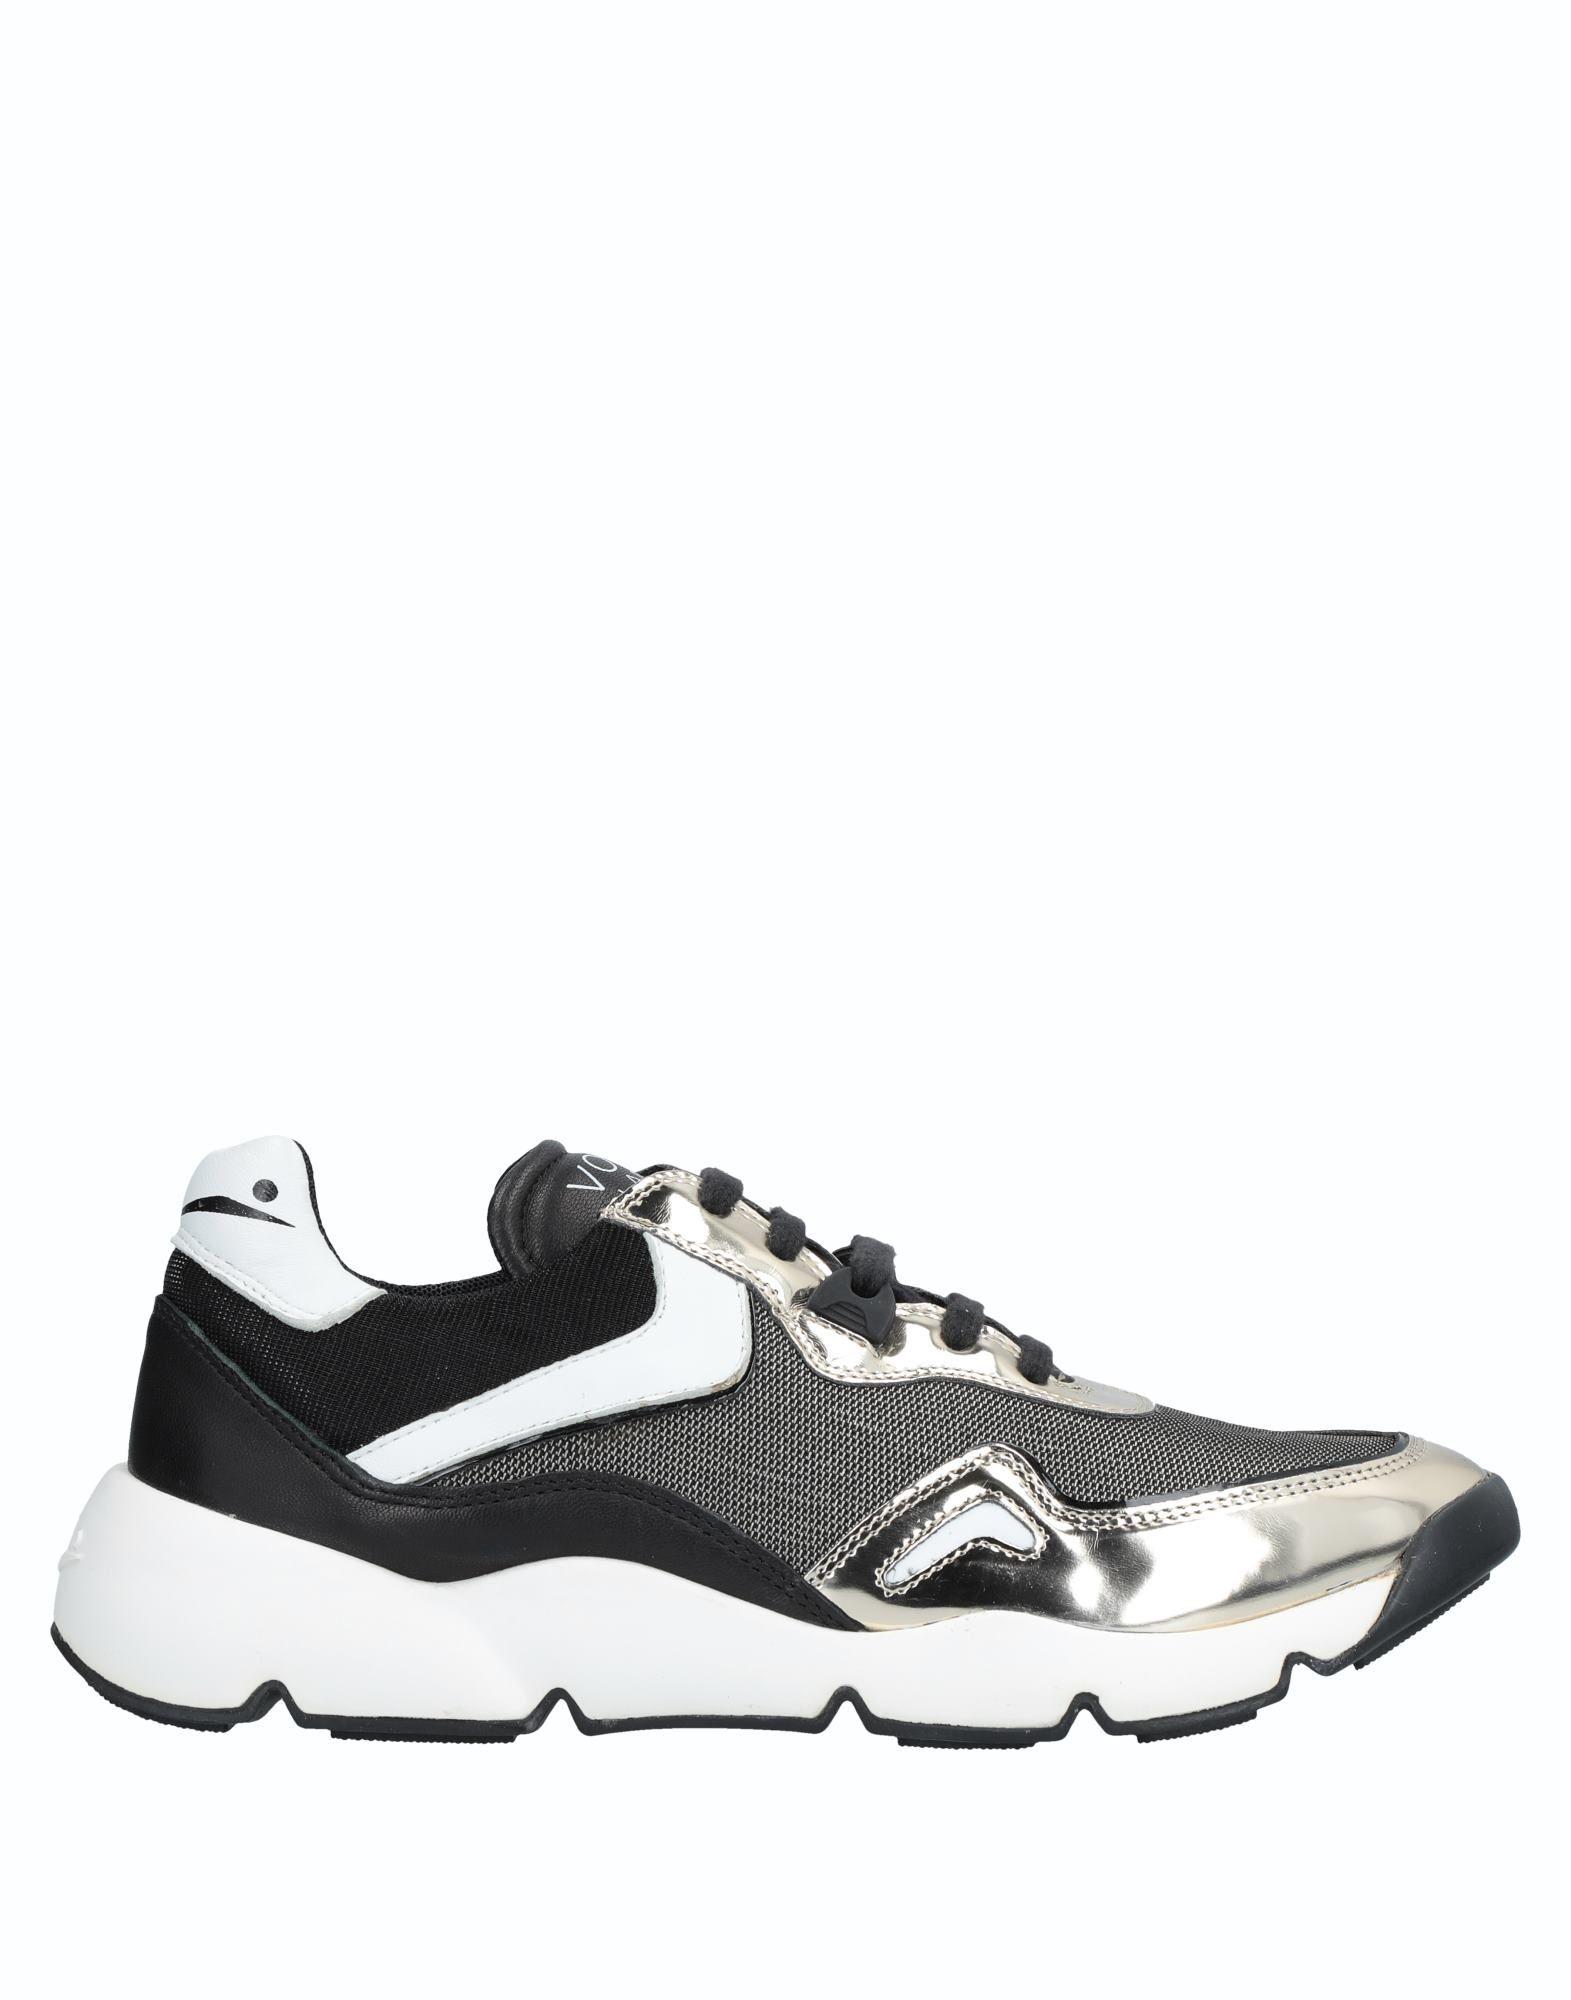 Stilvolle billige Schuhe Voile Blanche Sneakers Damen  11537111LD